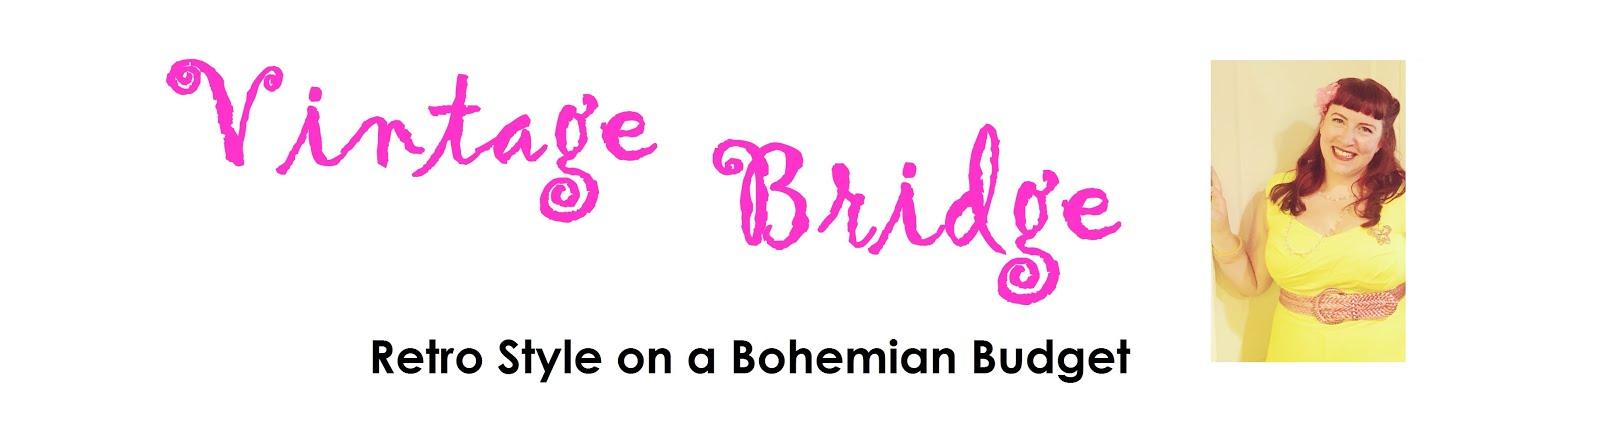 Vintage Bridge Style: Retro Style on a Bohemian Budget